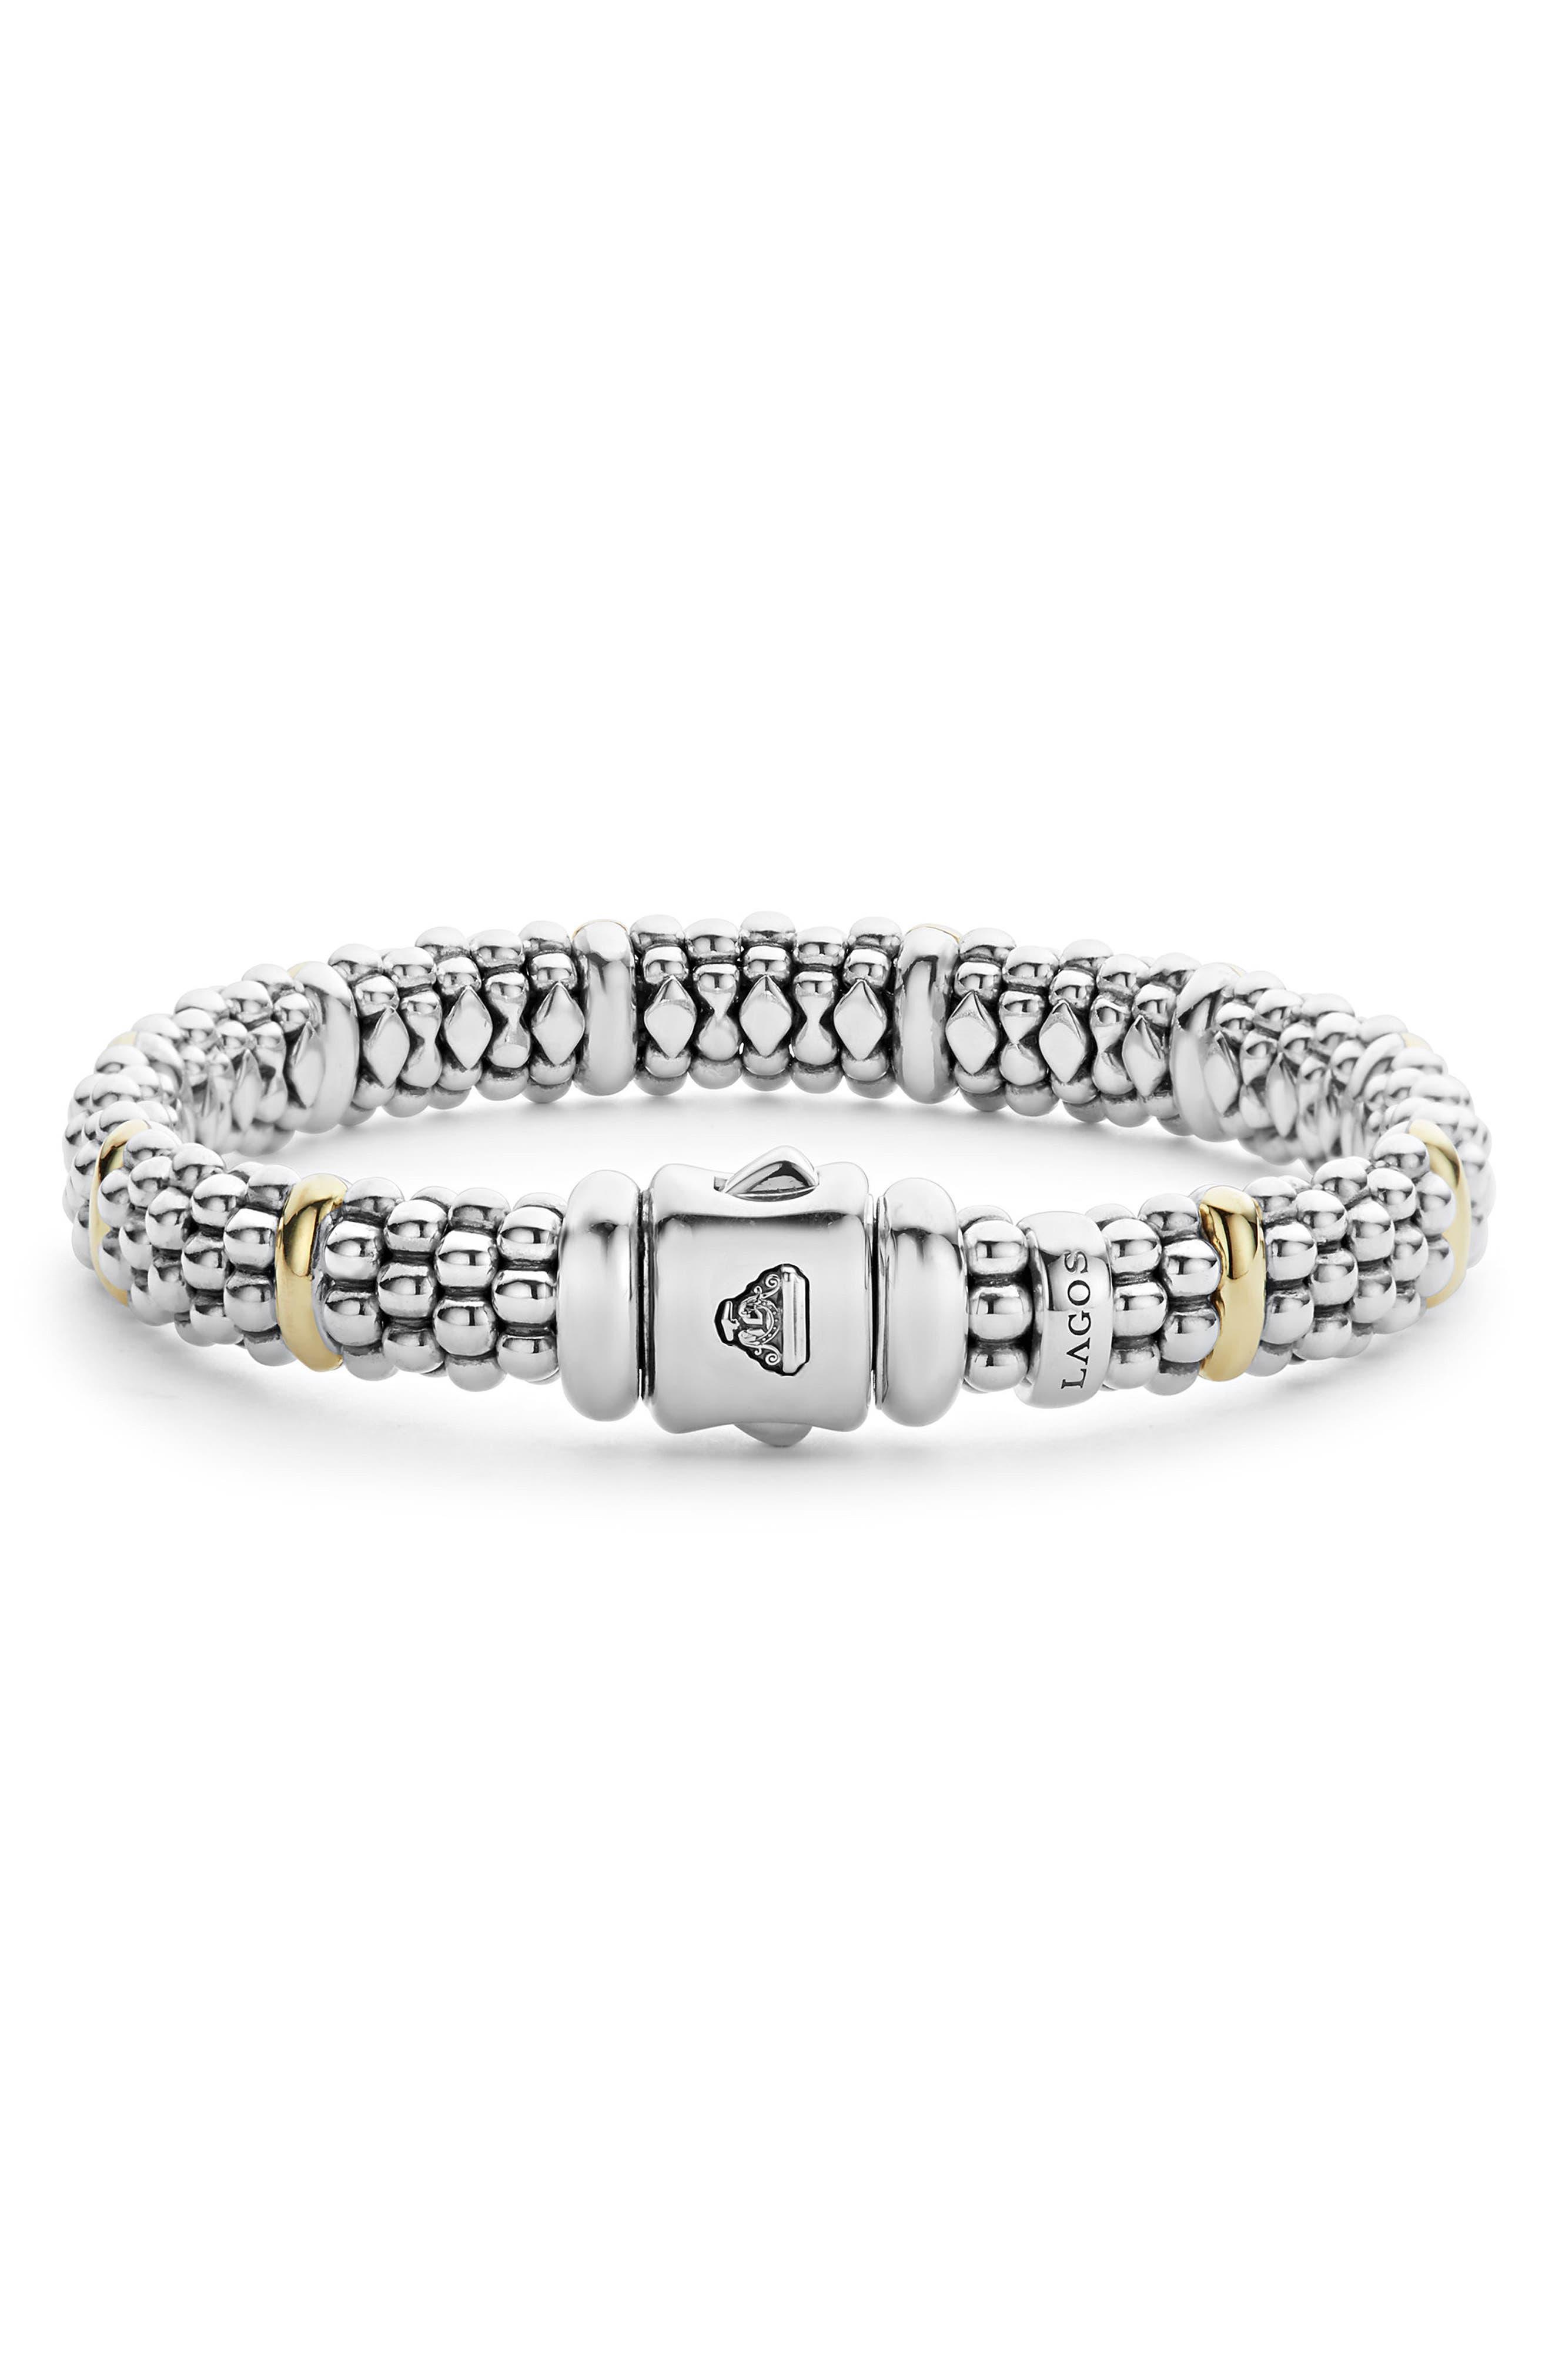 Oval Caviar Rope Bracelet,                             Alternate thumbnail 3, color,                             SILVER/ GOLD